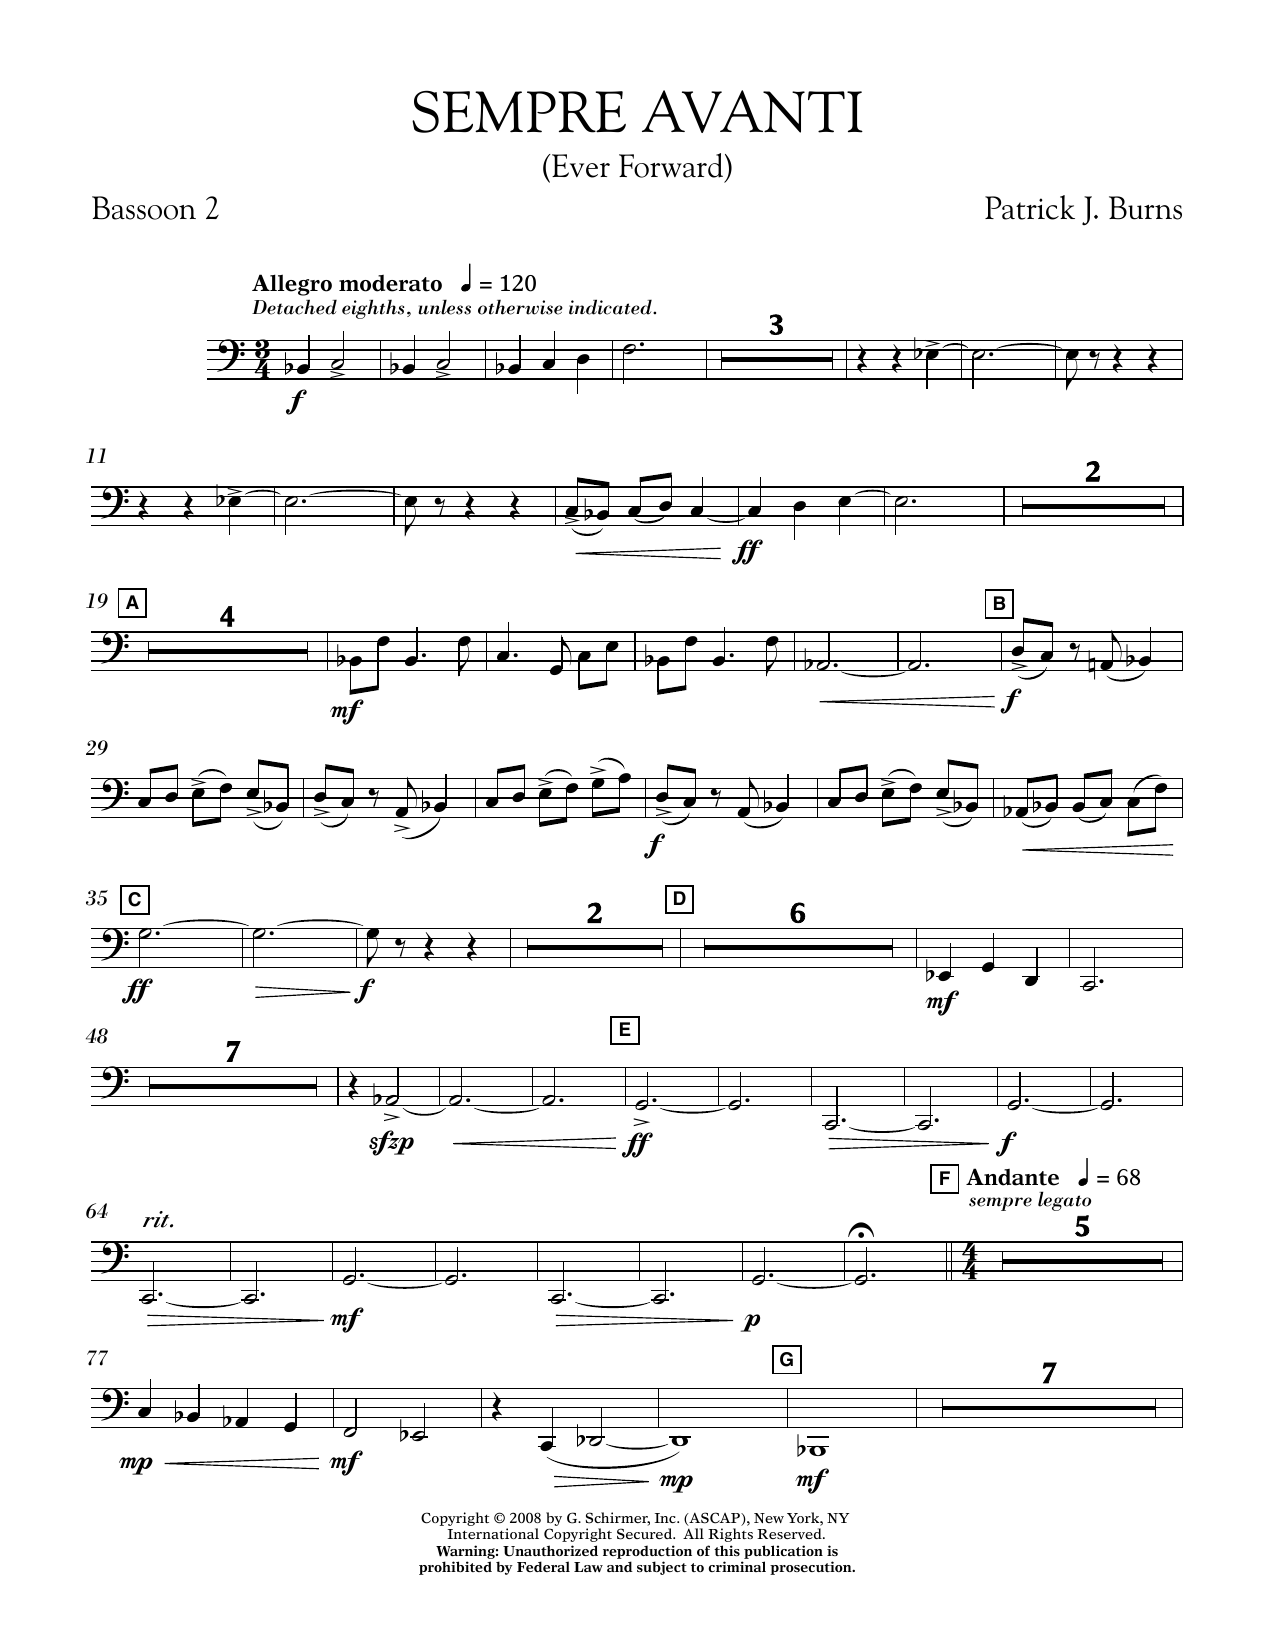 Sempre Avanti - Bassoon 2